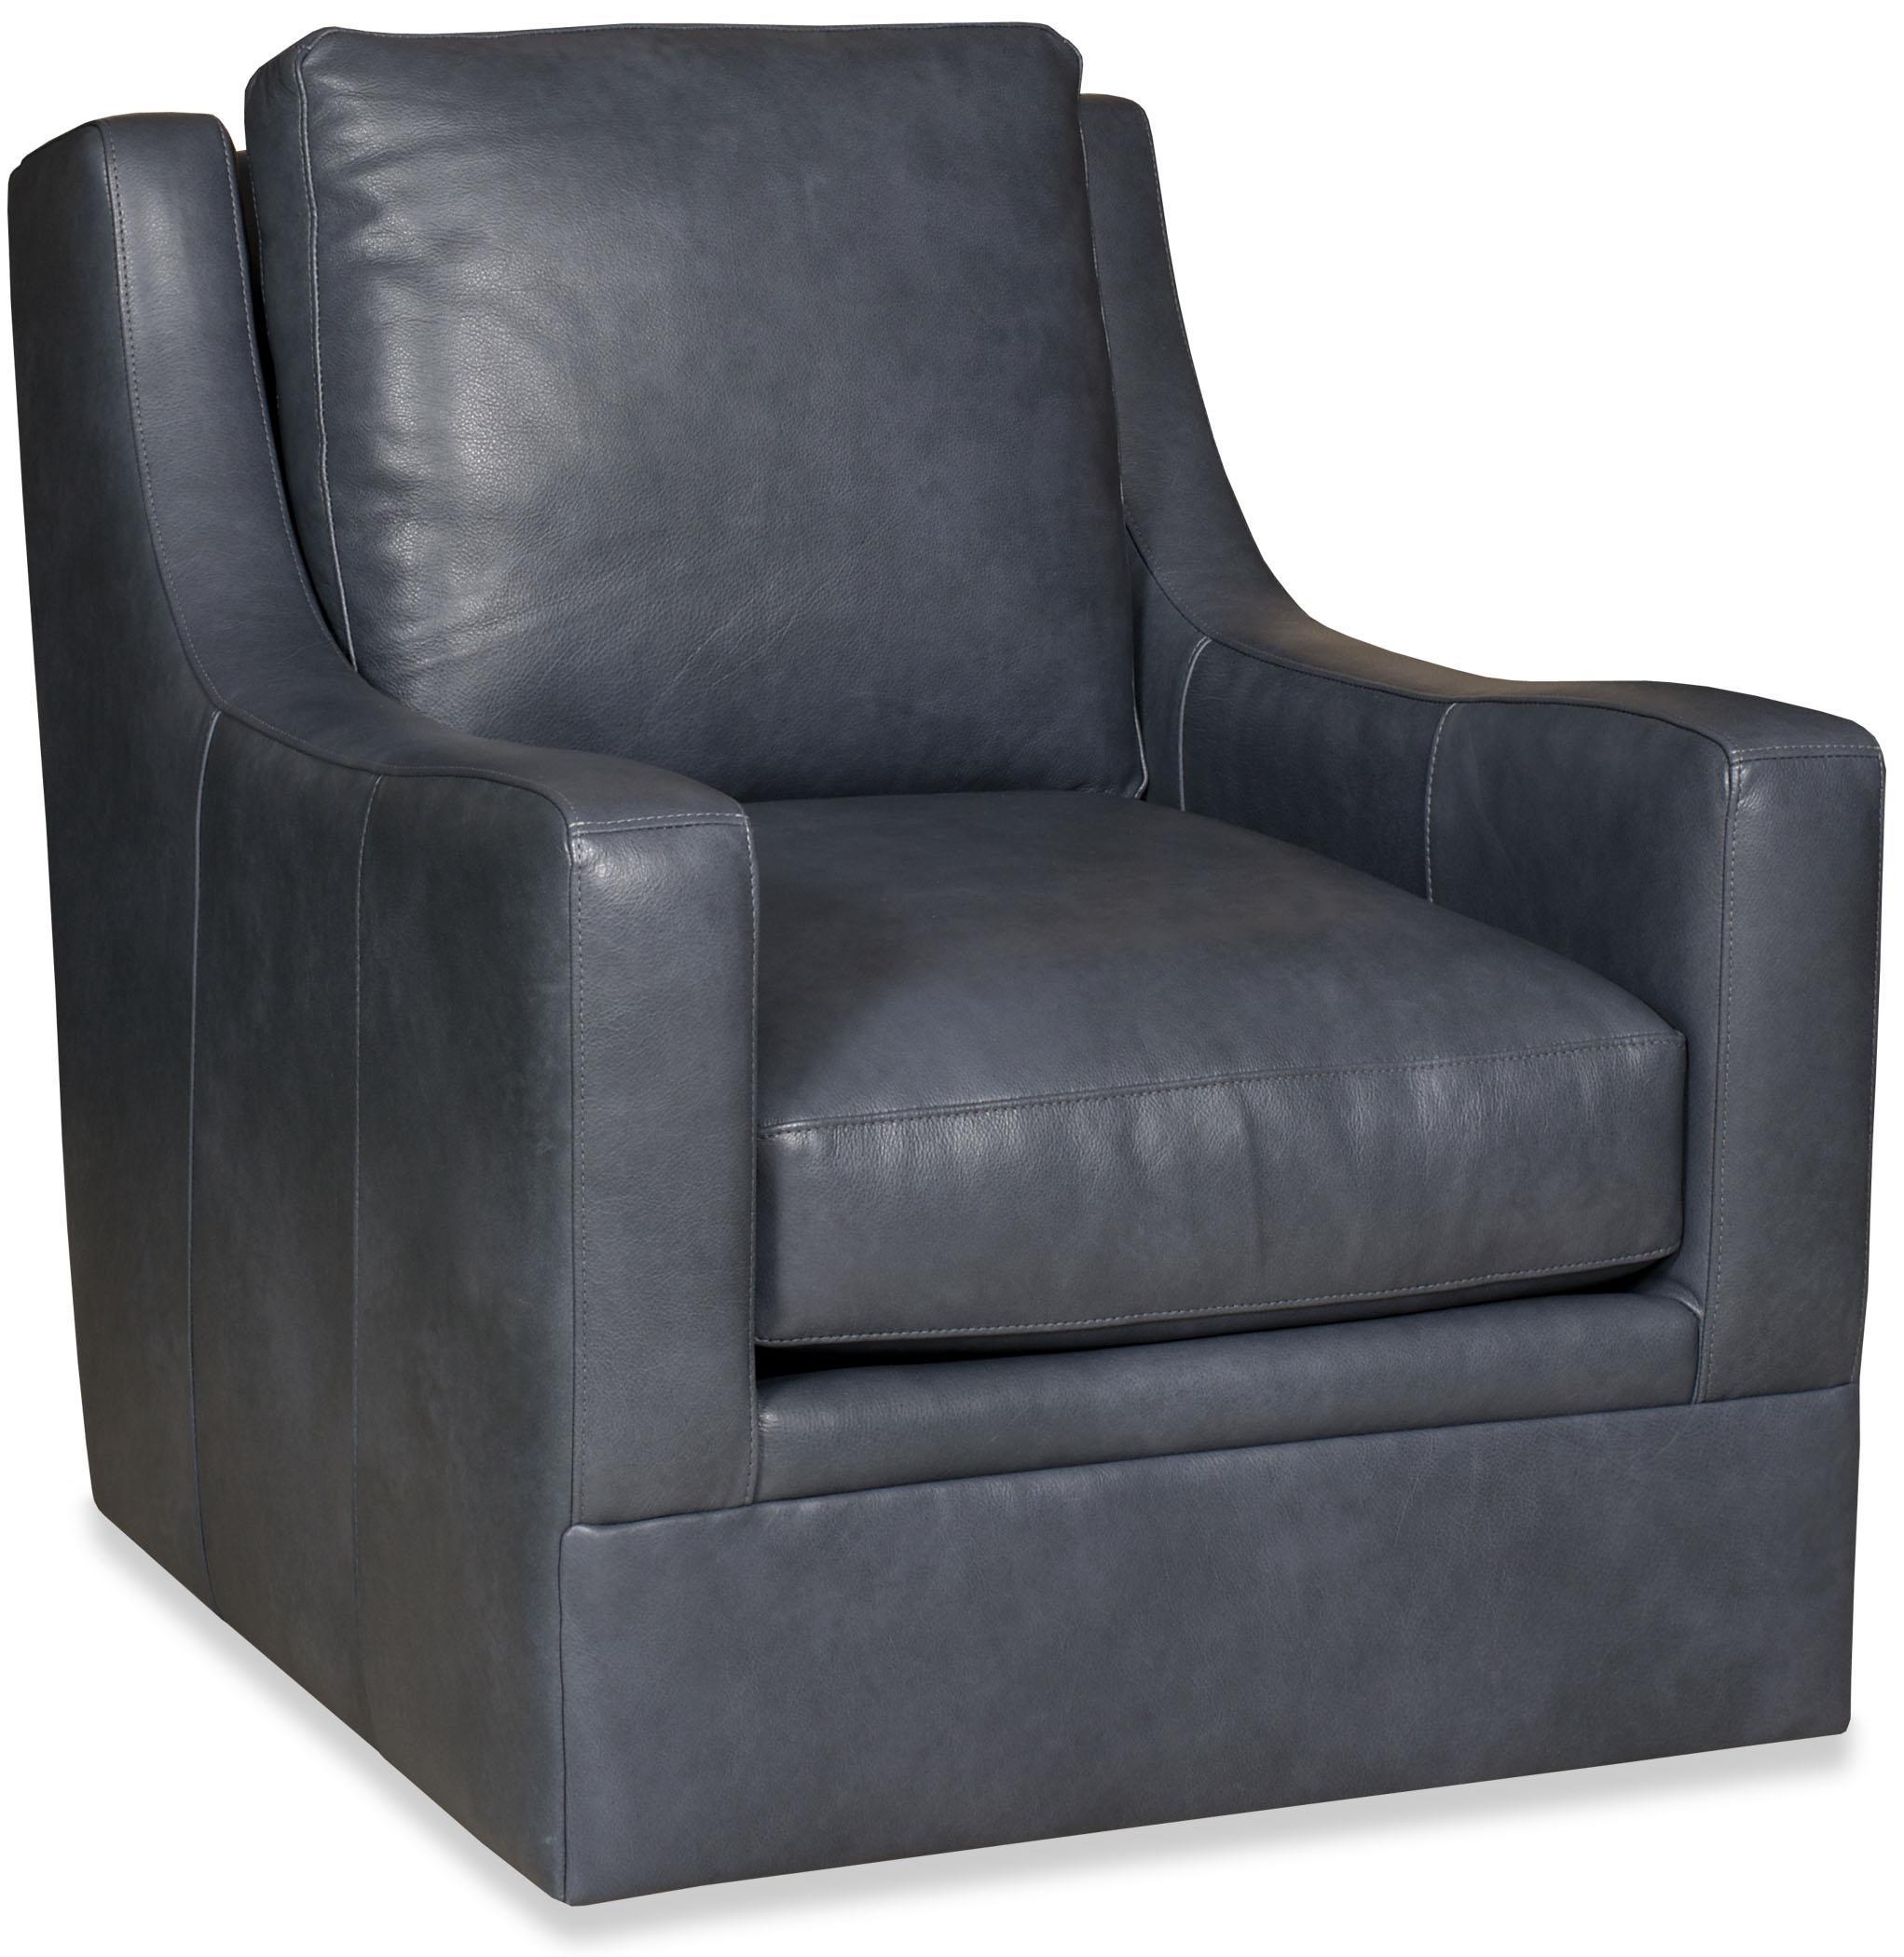 swivel tub chairs printed dining bradington young jagger chair sprintz chairsswivel